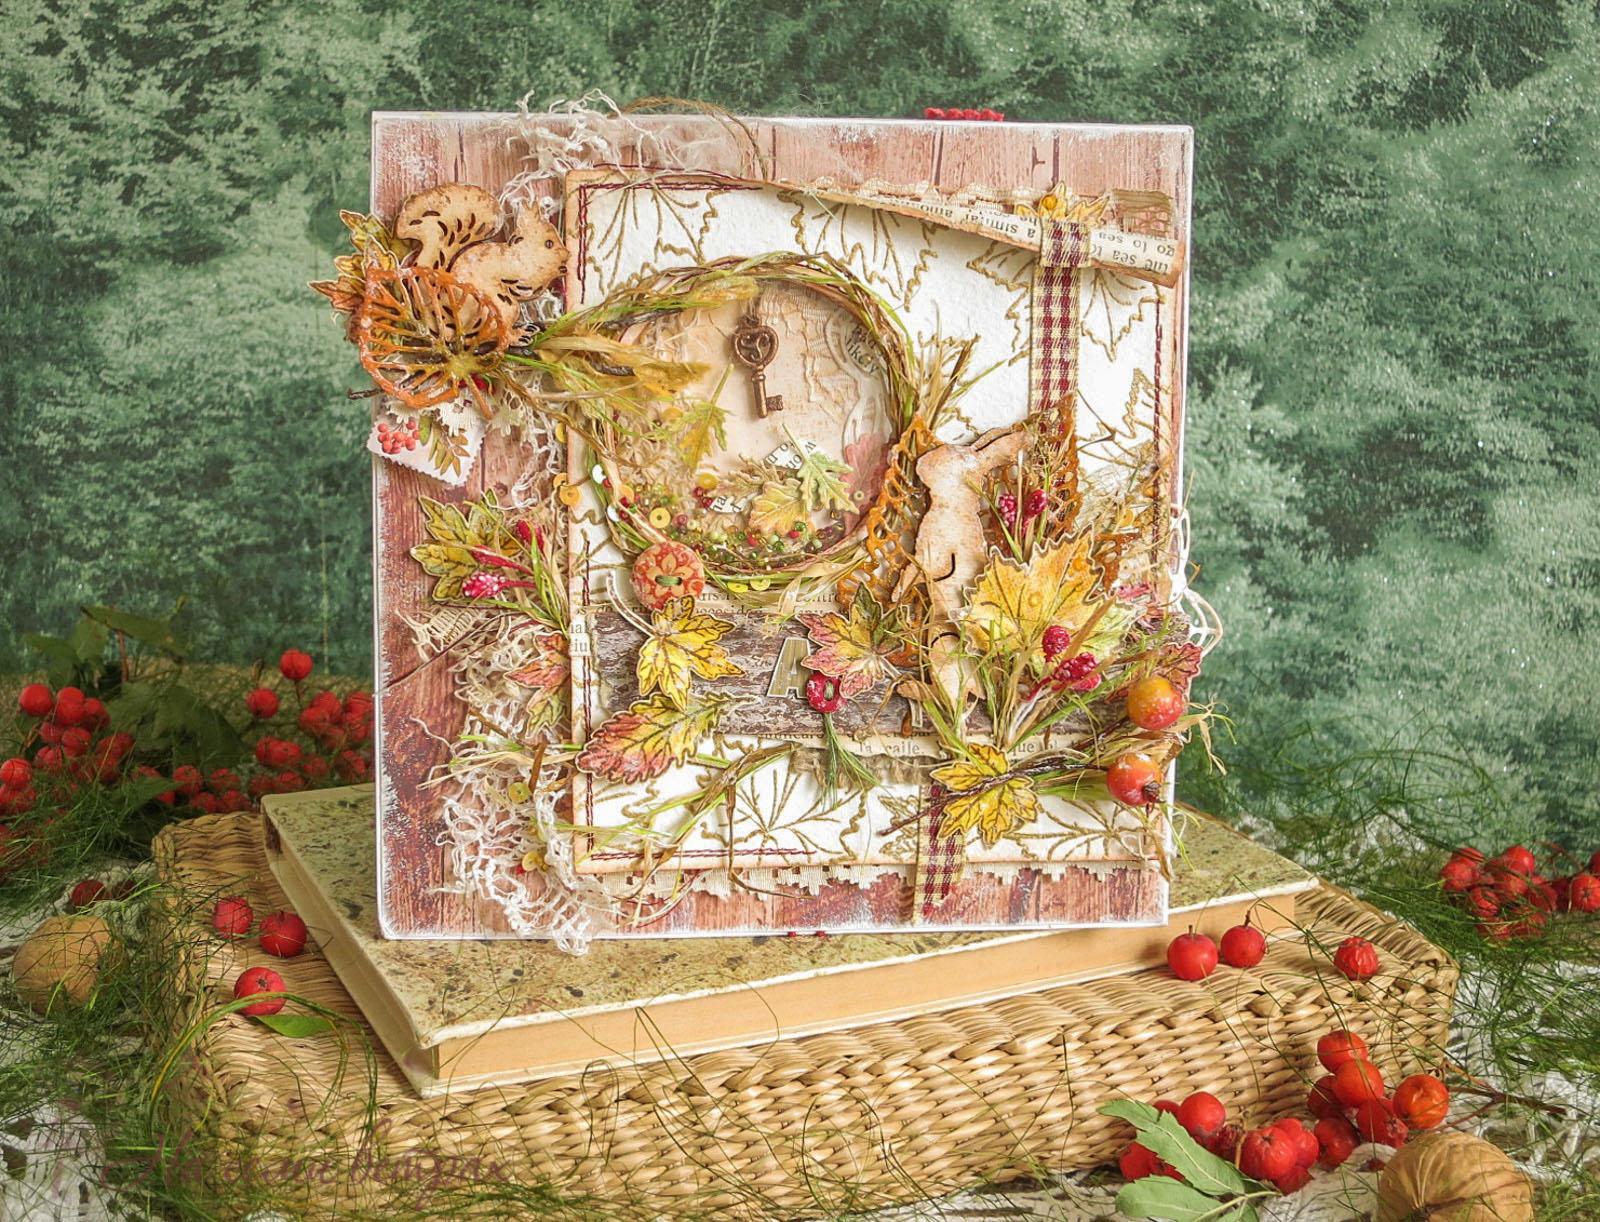 Осіння листівка Казка кленового лісу, autumn, cardmaking, papercraft, scrapbooking, hare, autumn leaves, shaker card, squirrel, білка, заєць, листівка з шейкером, открытка с шейкером, осенние листья